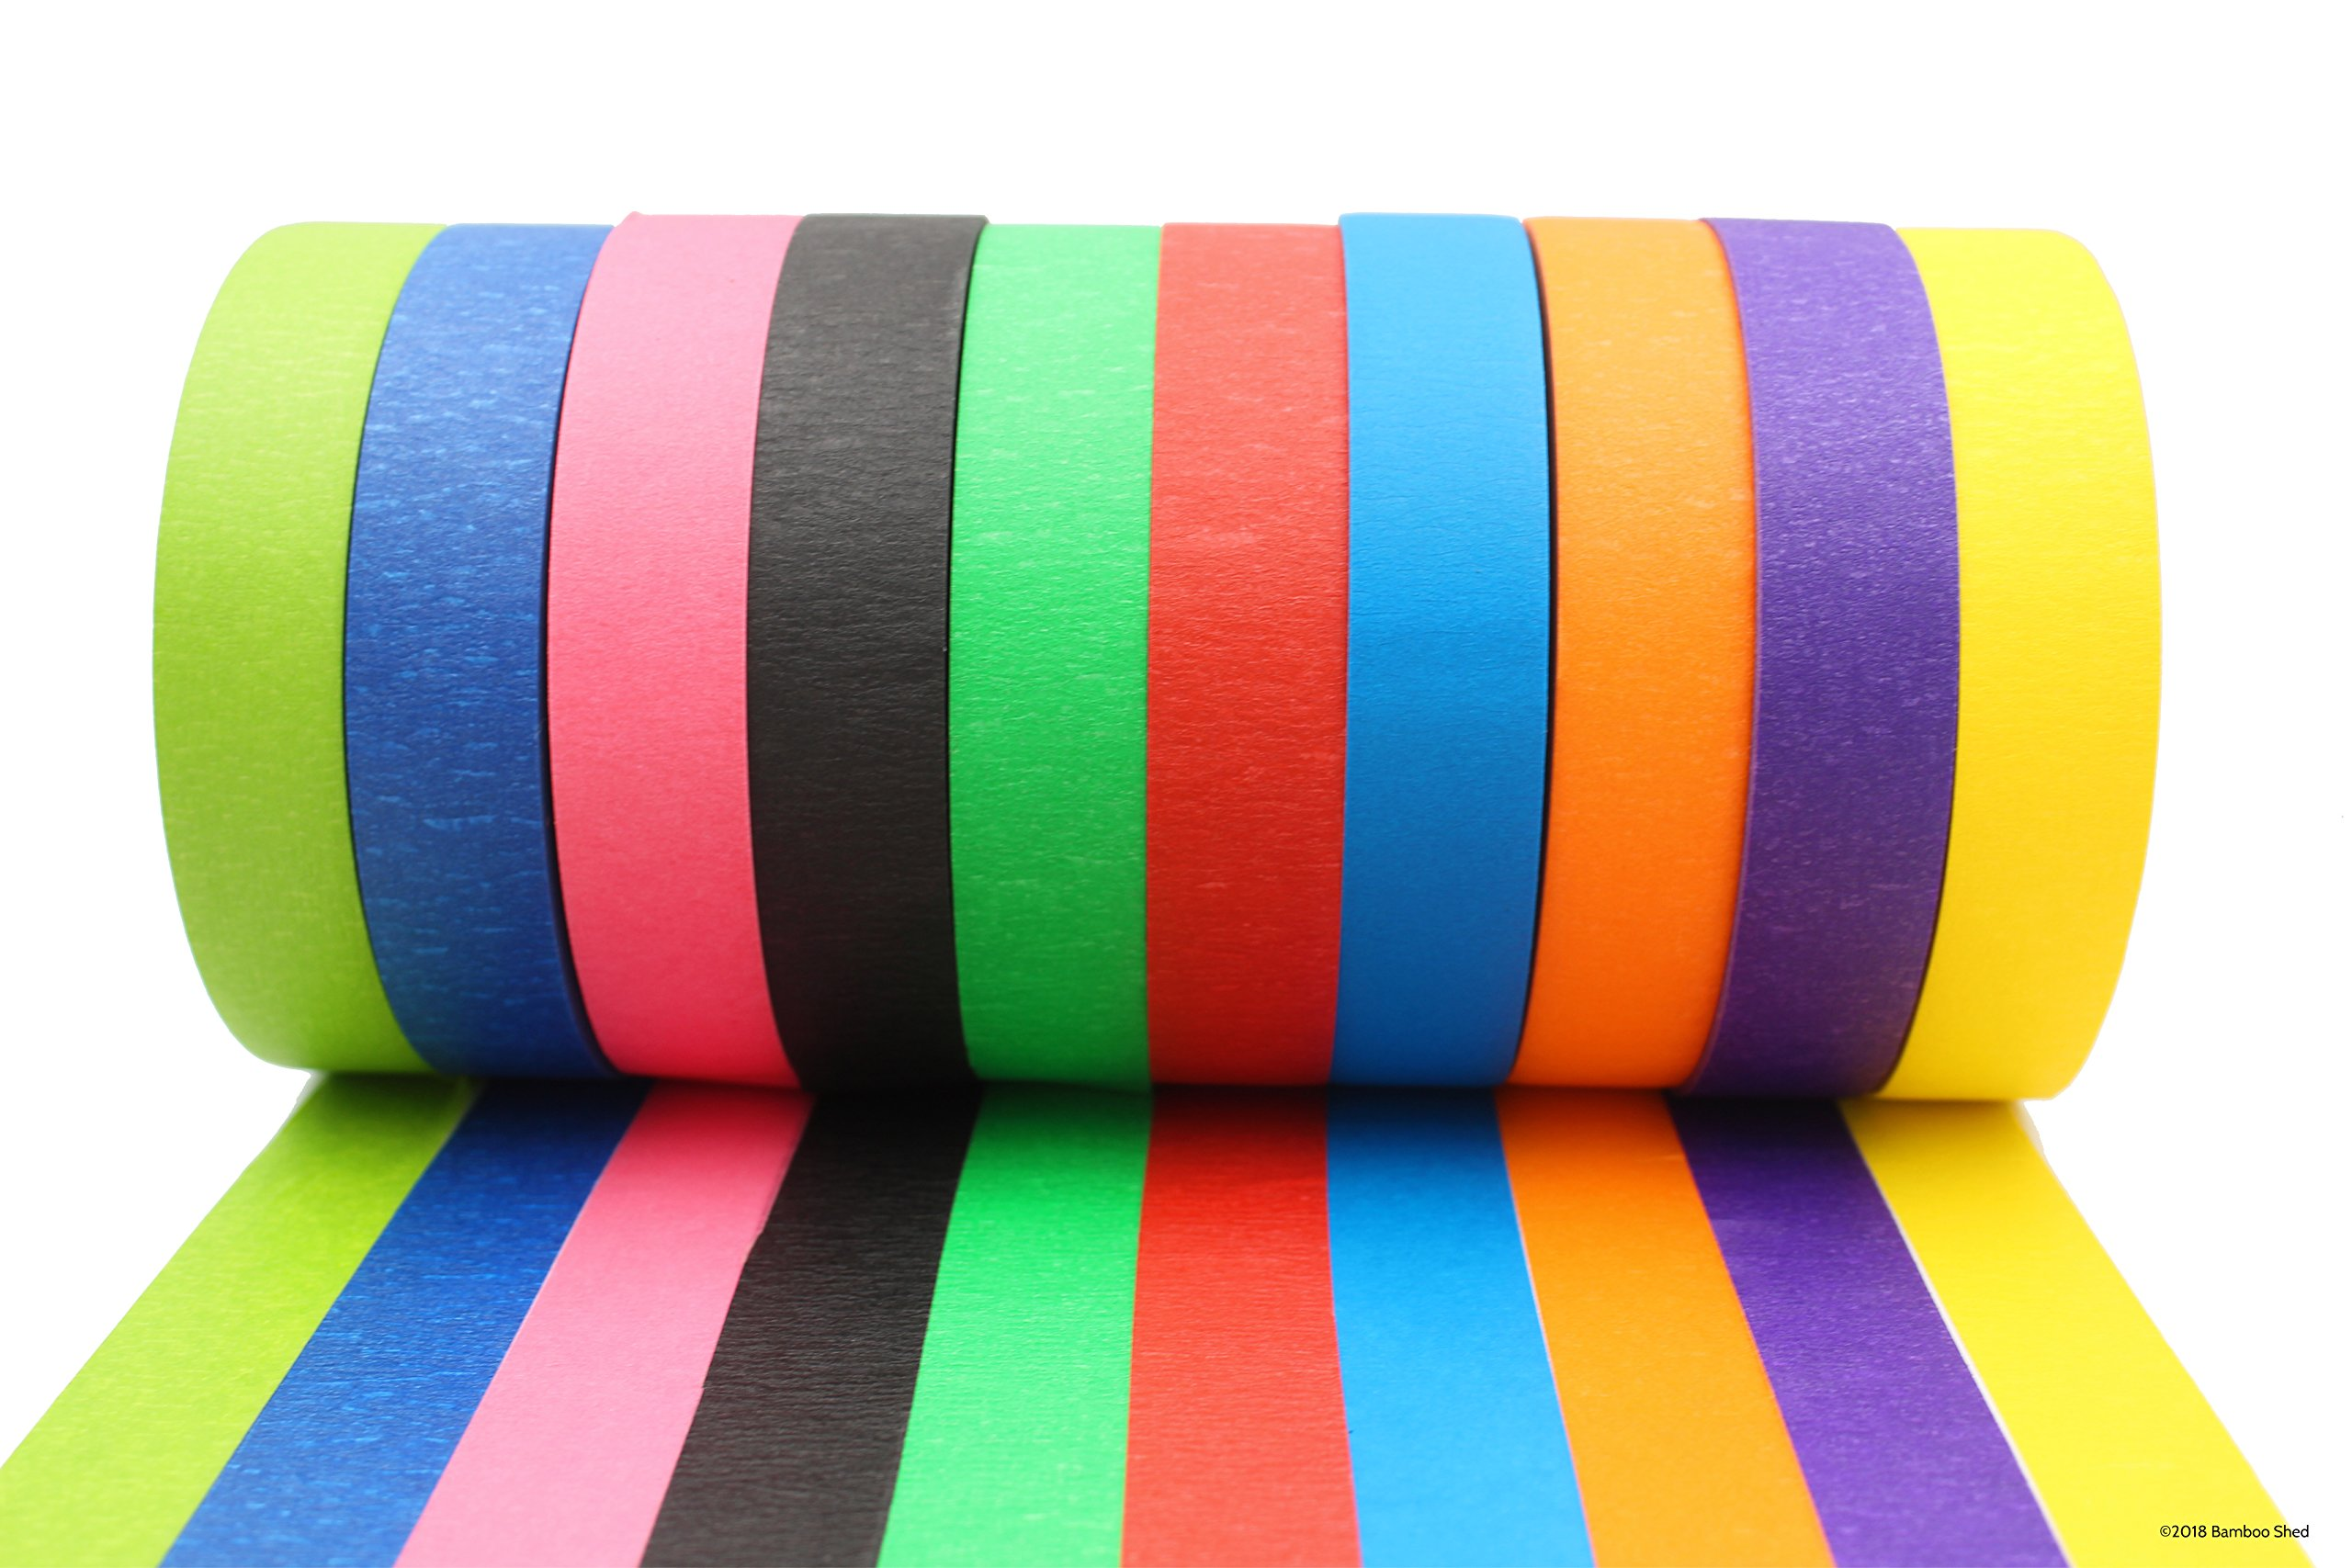 Colored Tape - Decorative Writable Masking Tape - Large ...